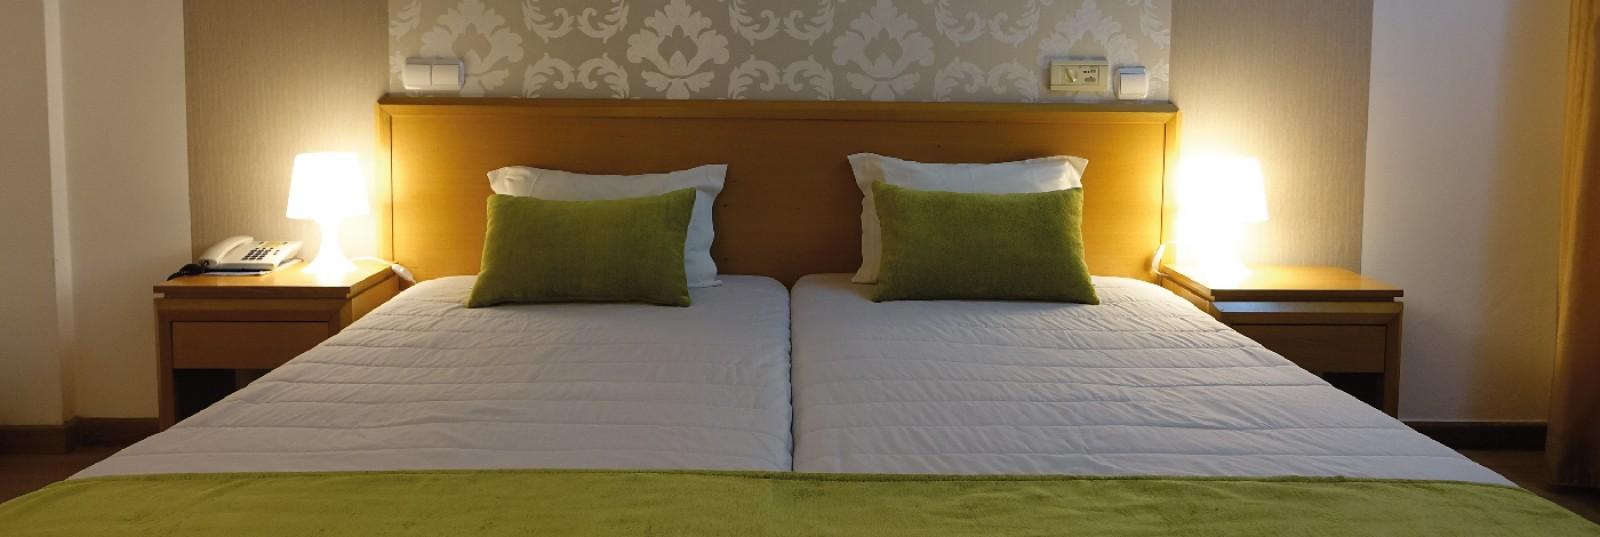 Hotel Eurosol Alcanena - twin room